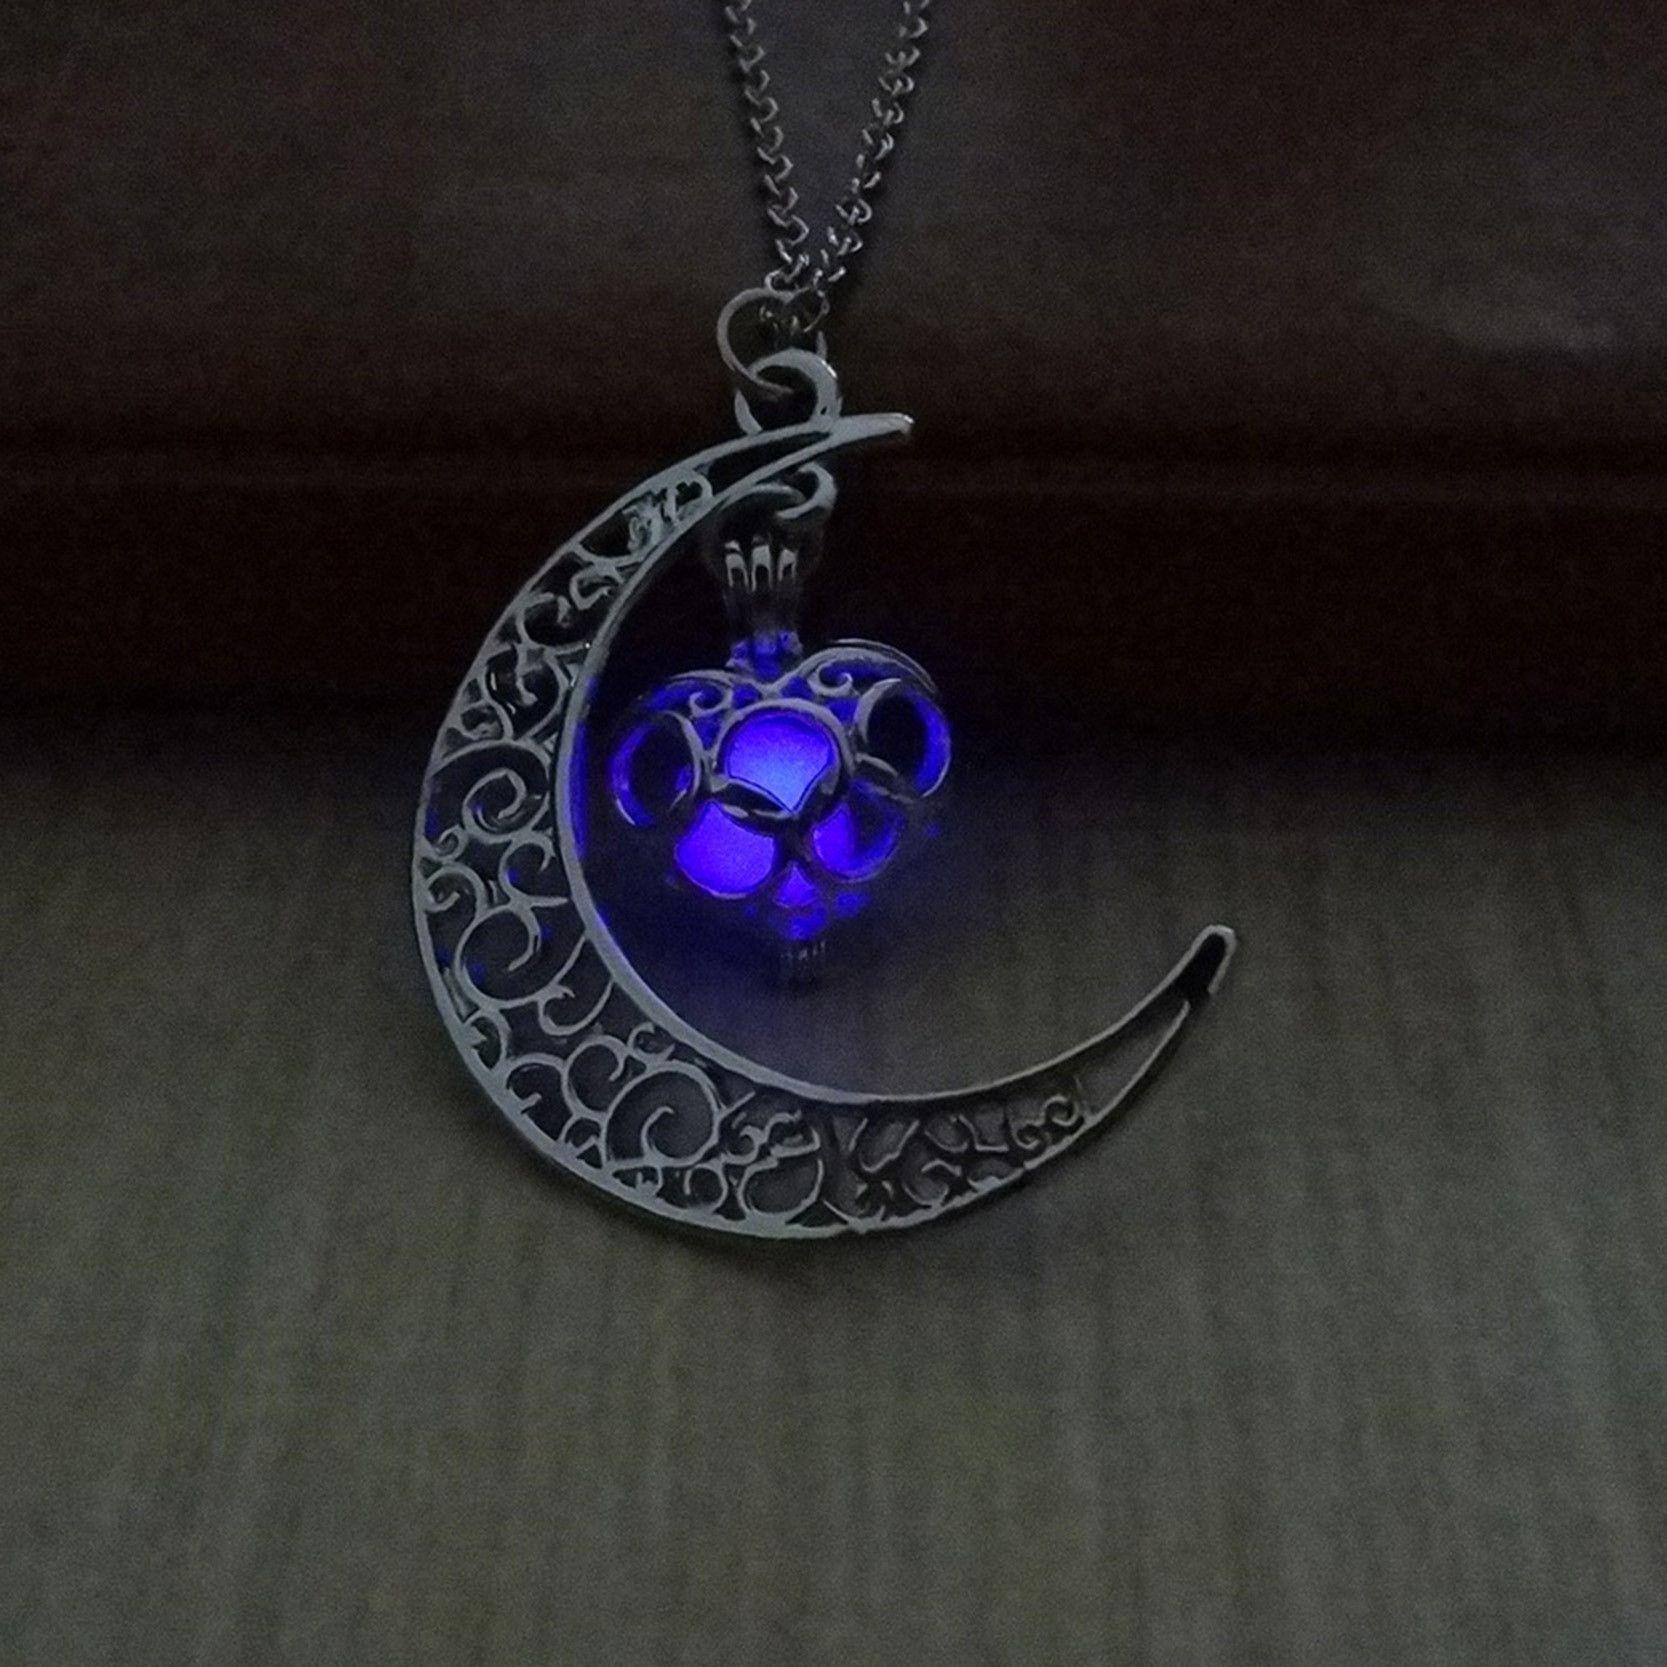 Glow-in-the-Dark Crescent Moon Heart Necklaces